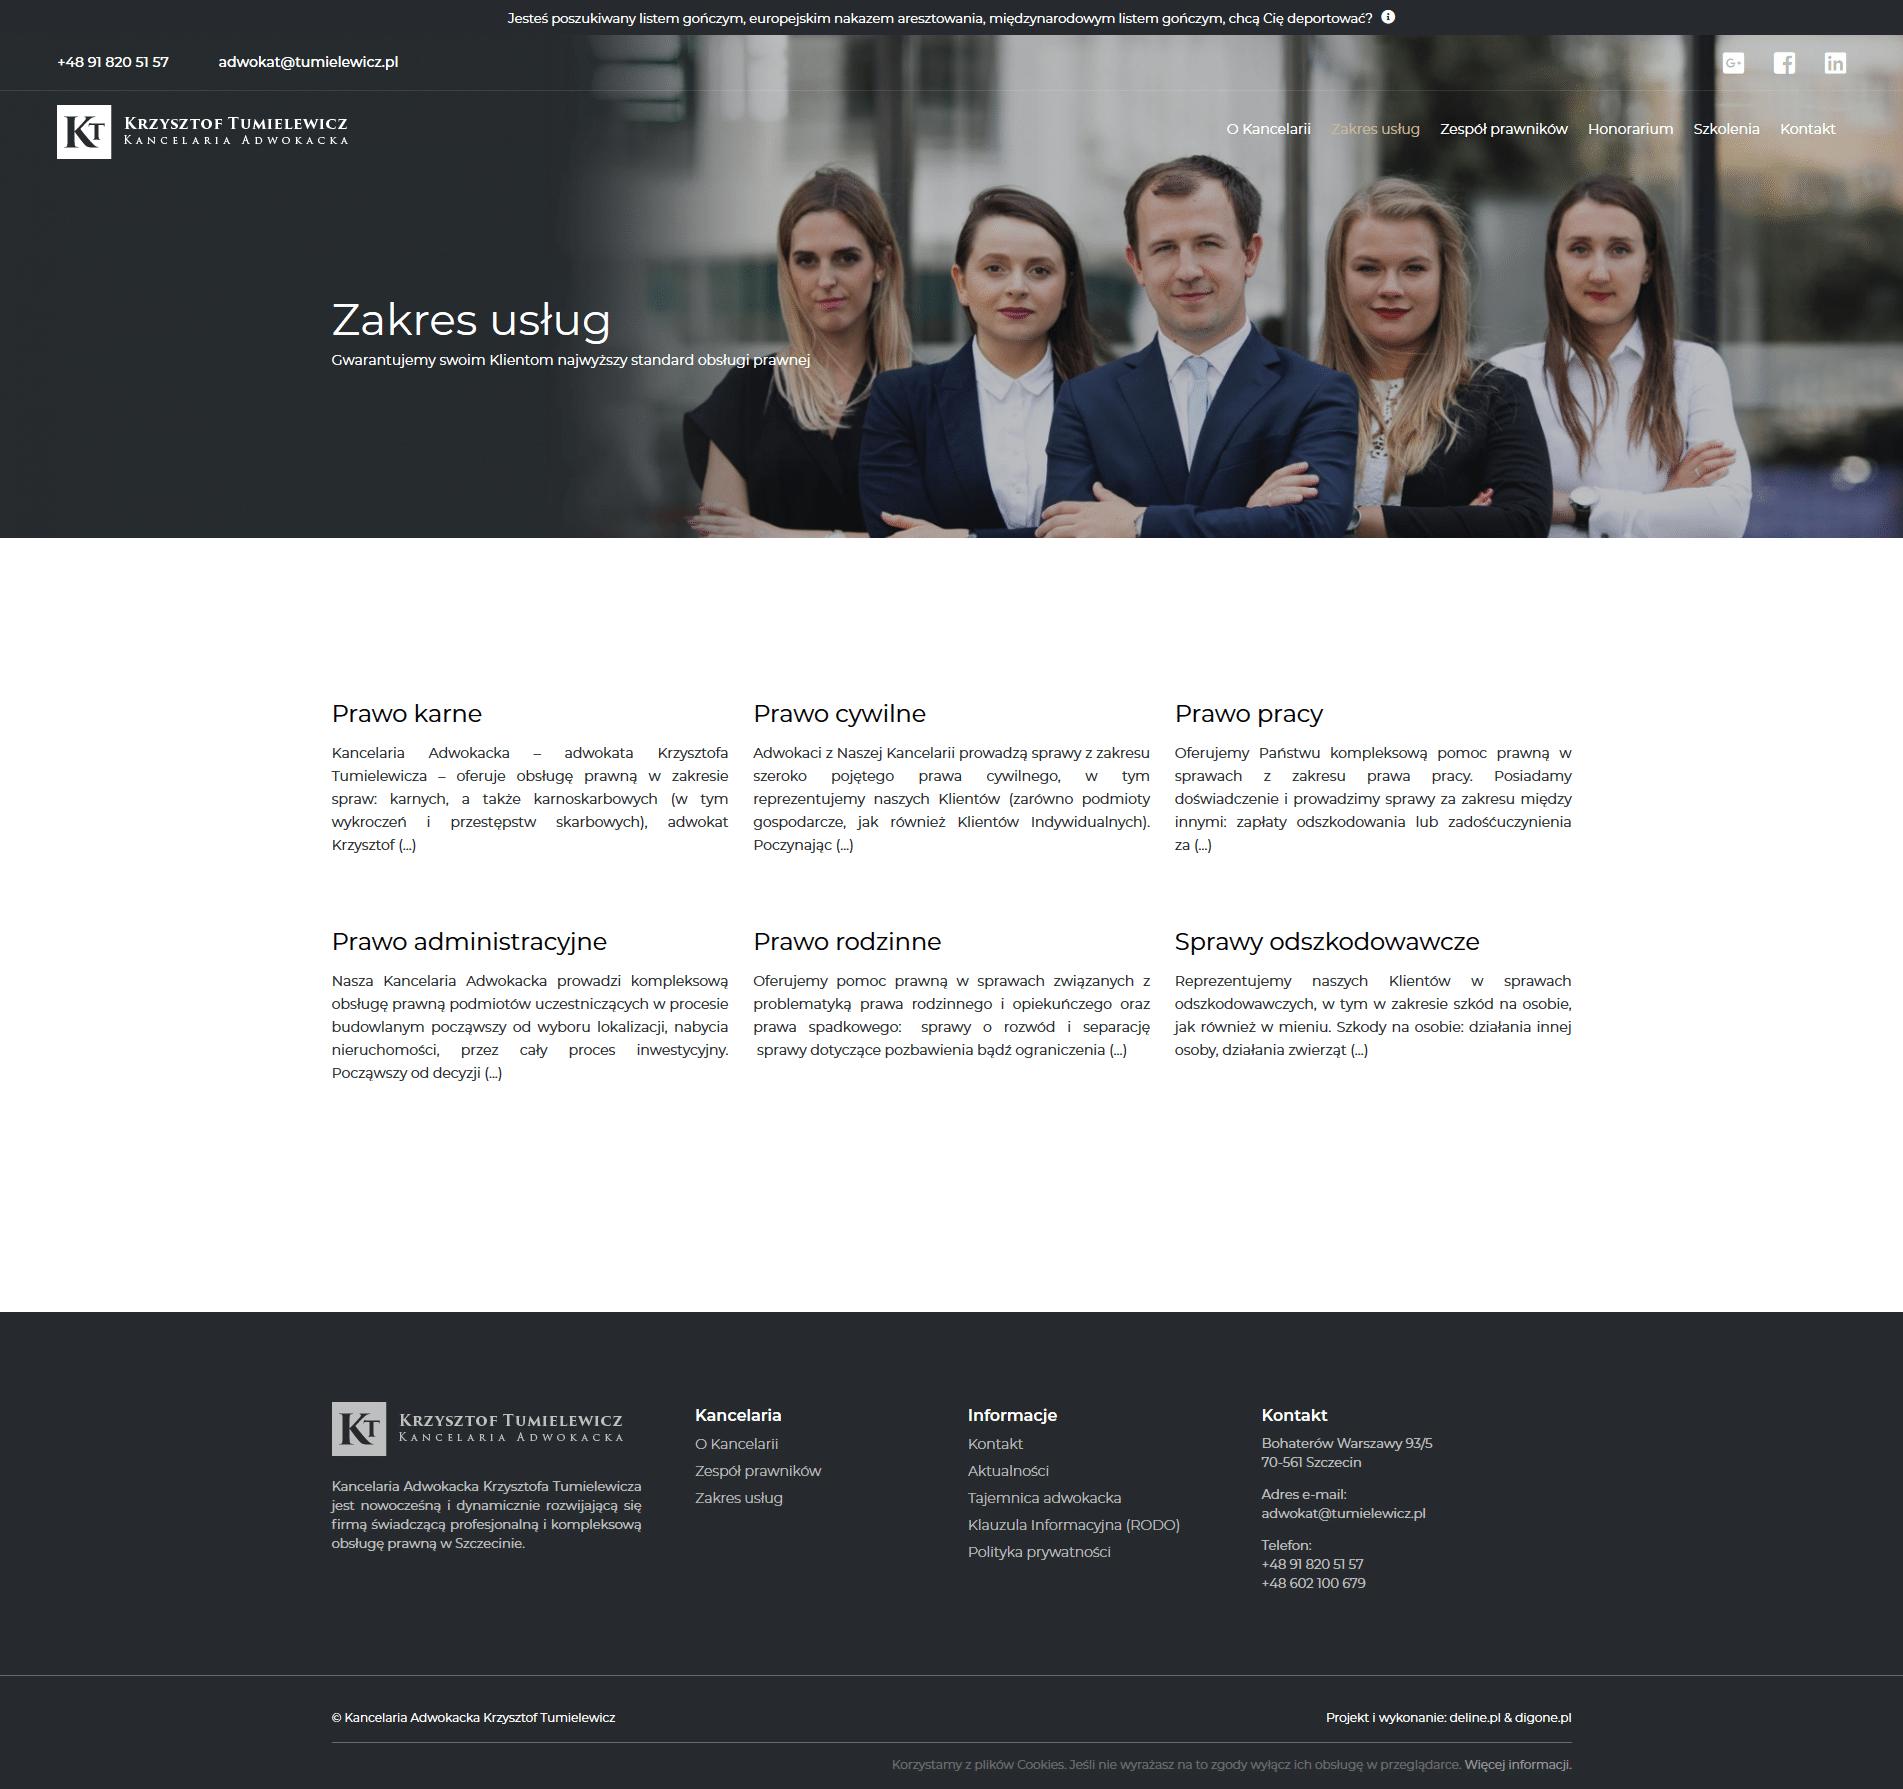 adwokat strona internetowa kancelaria adwokacka